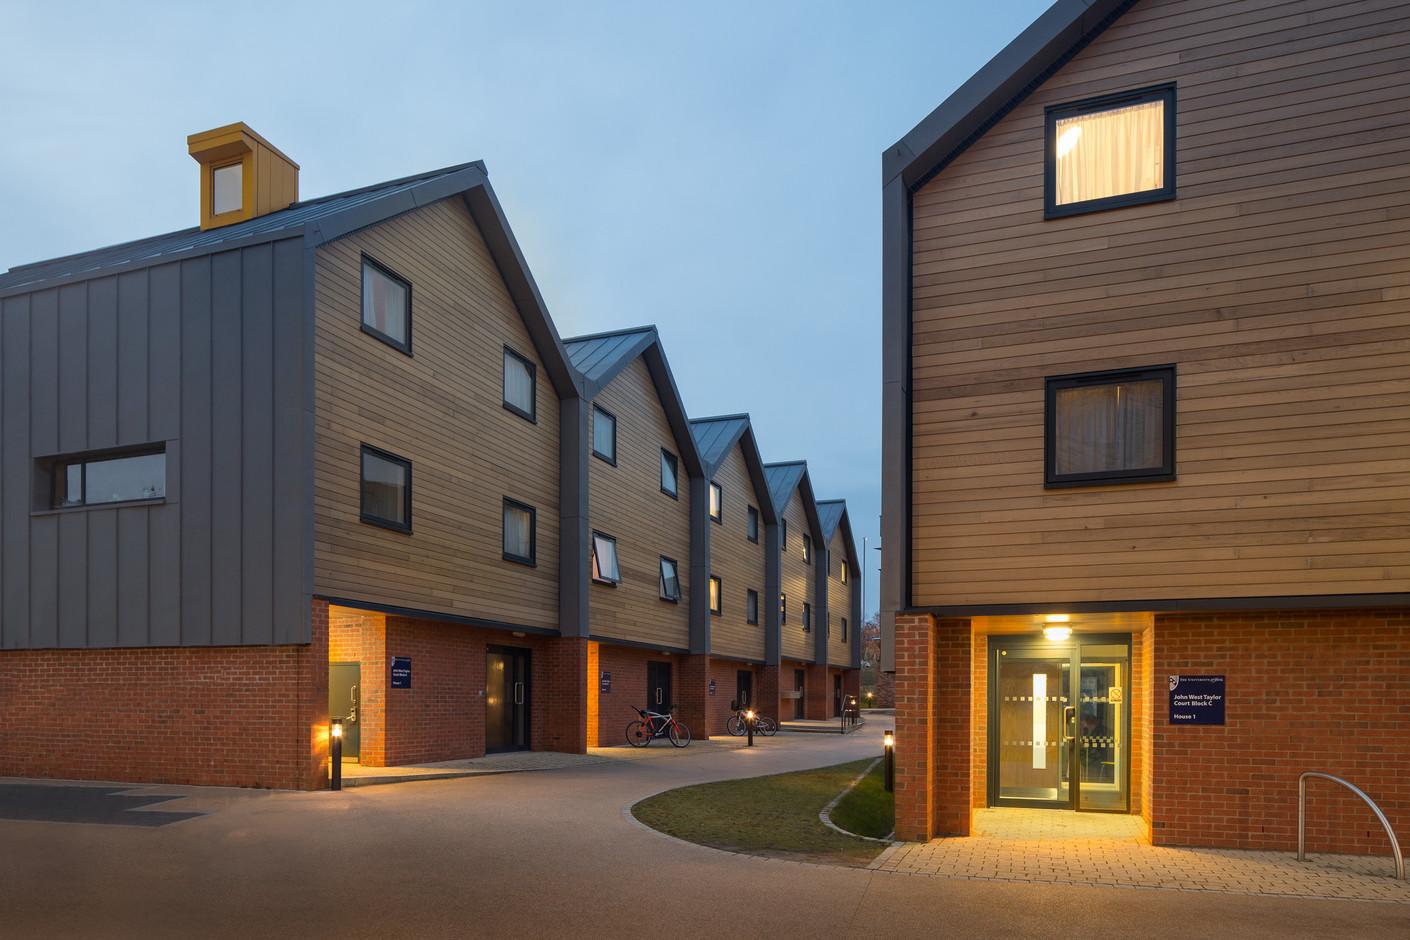 Student Accommodation, The University of York